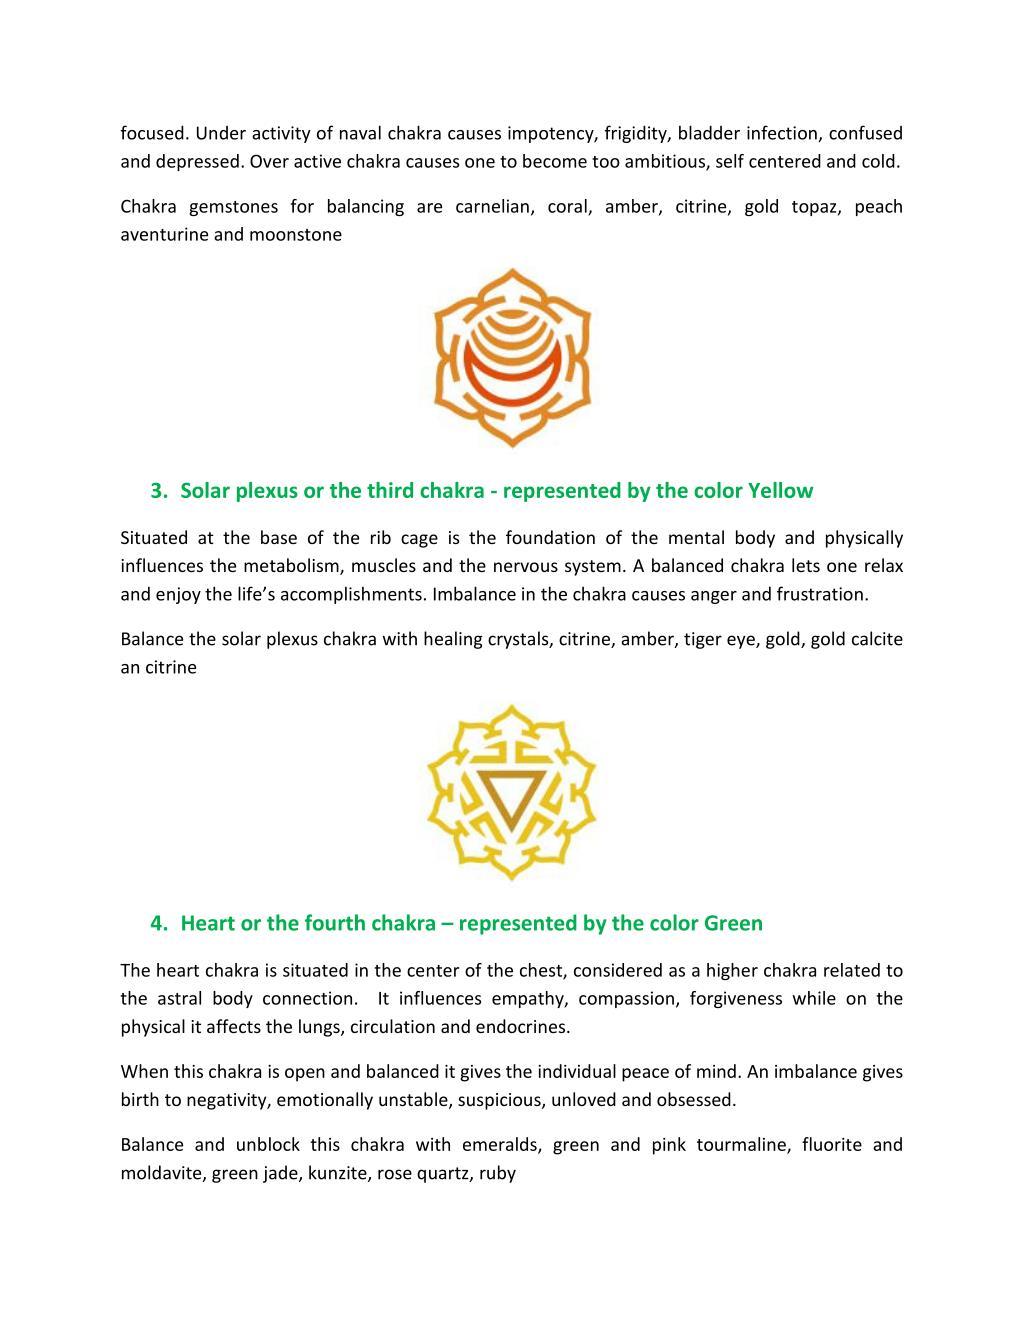 PPT - Healing Gemstone With 7 Chakras Meditation PowerPoint